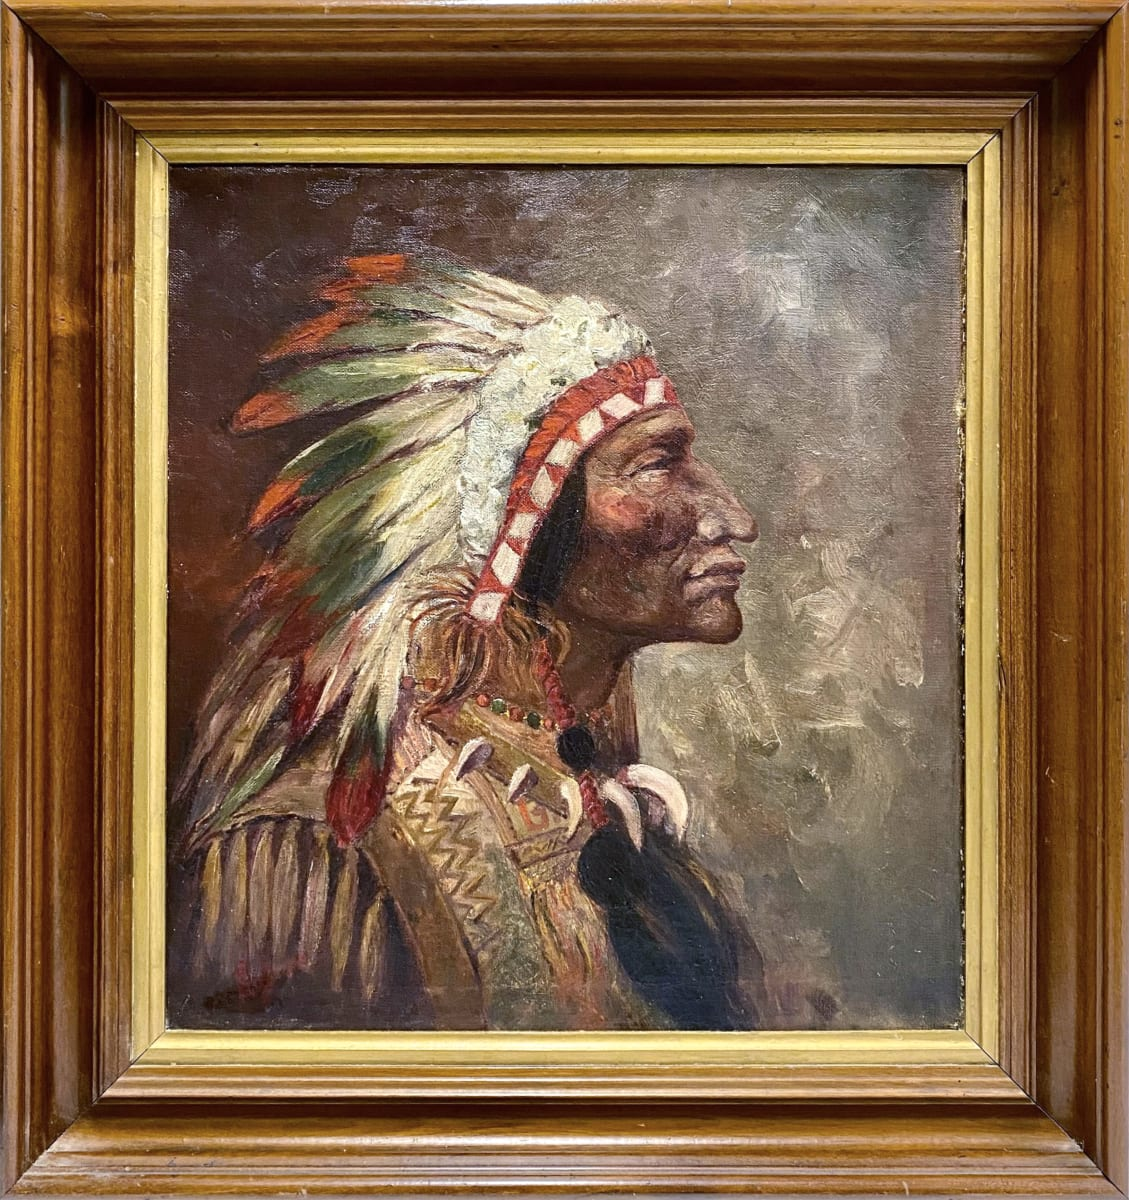 0322 - Aboriginal Chief (portrait)